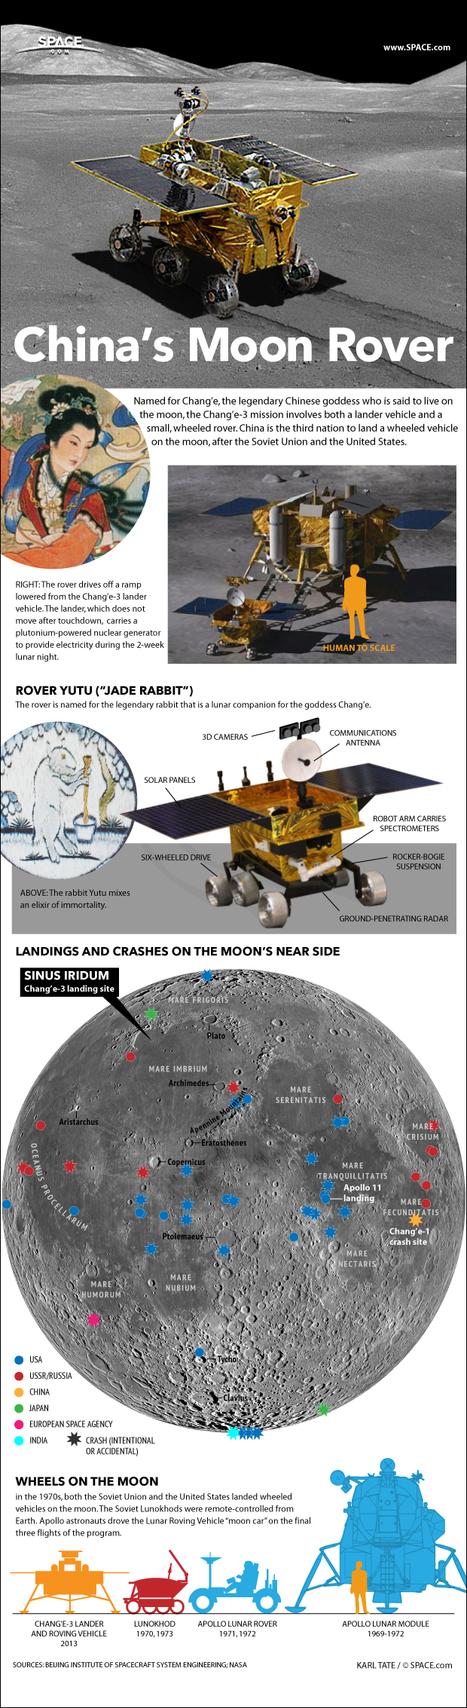 China Moon Landing: 'Jade Rabbit' Rover Basks in Lunar Bay of Rainbows | Amazing Science | Scoop.it